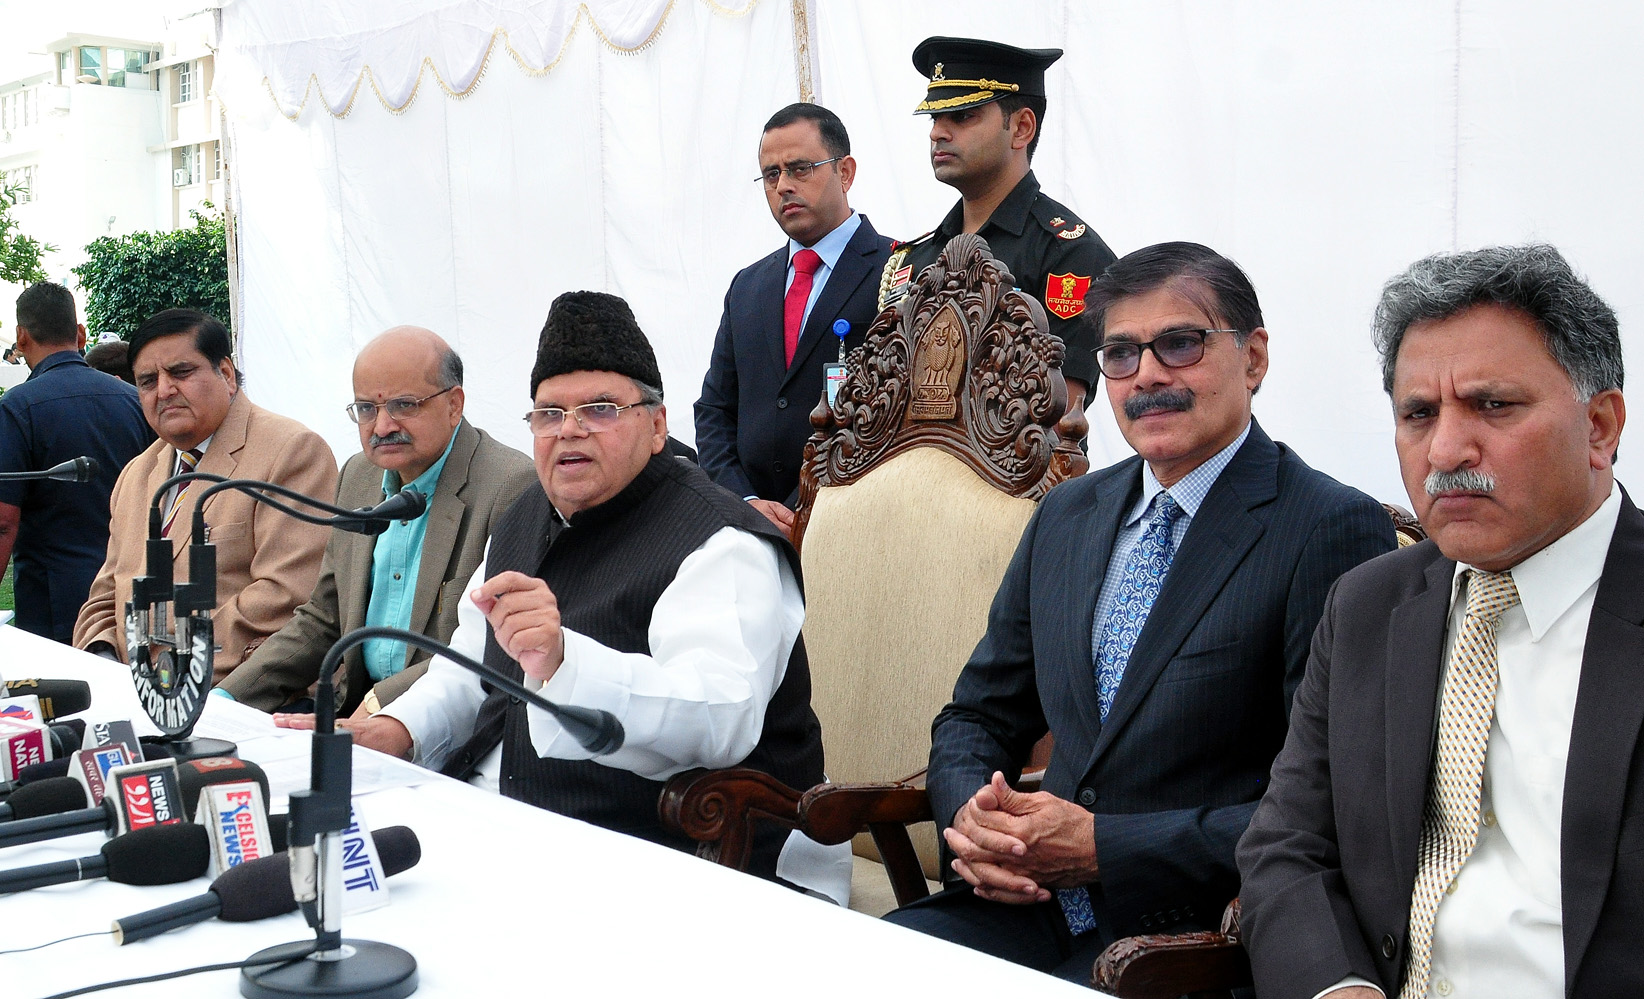 Governor Satya Pal Malik flanked by his advisors and Chief Secretary addressing a presser on Darbar opening at civil secretariat Jammu on Monday